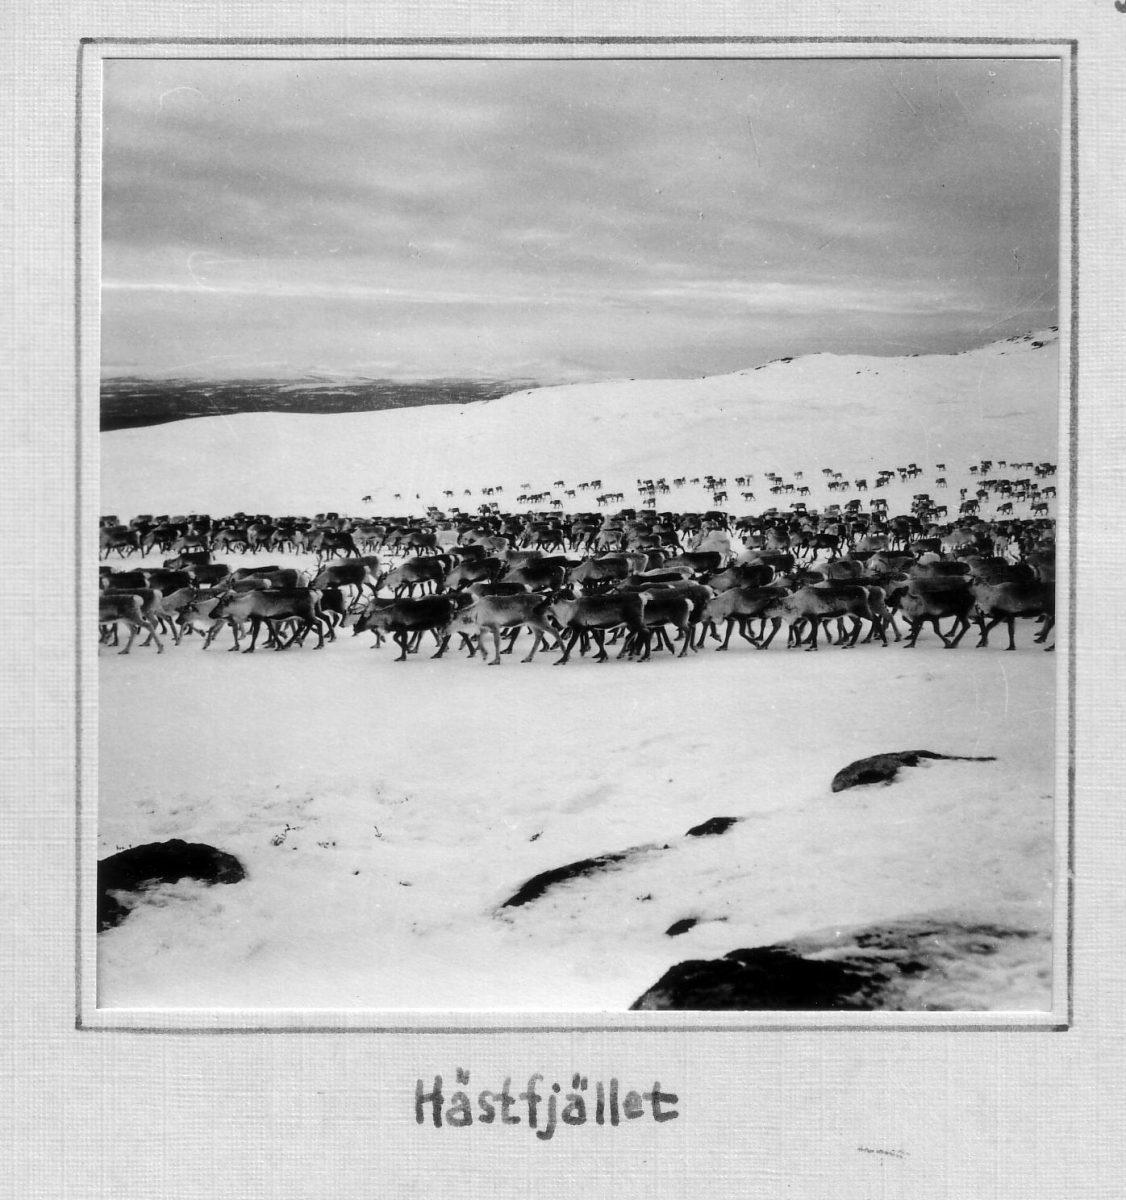 S.40 Hästfjället Bild 1